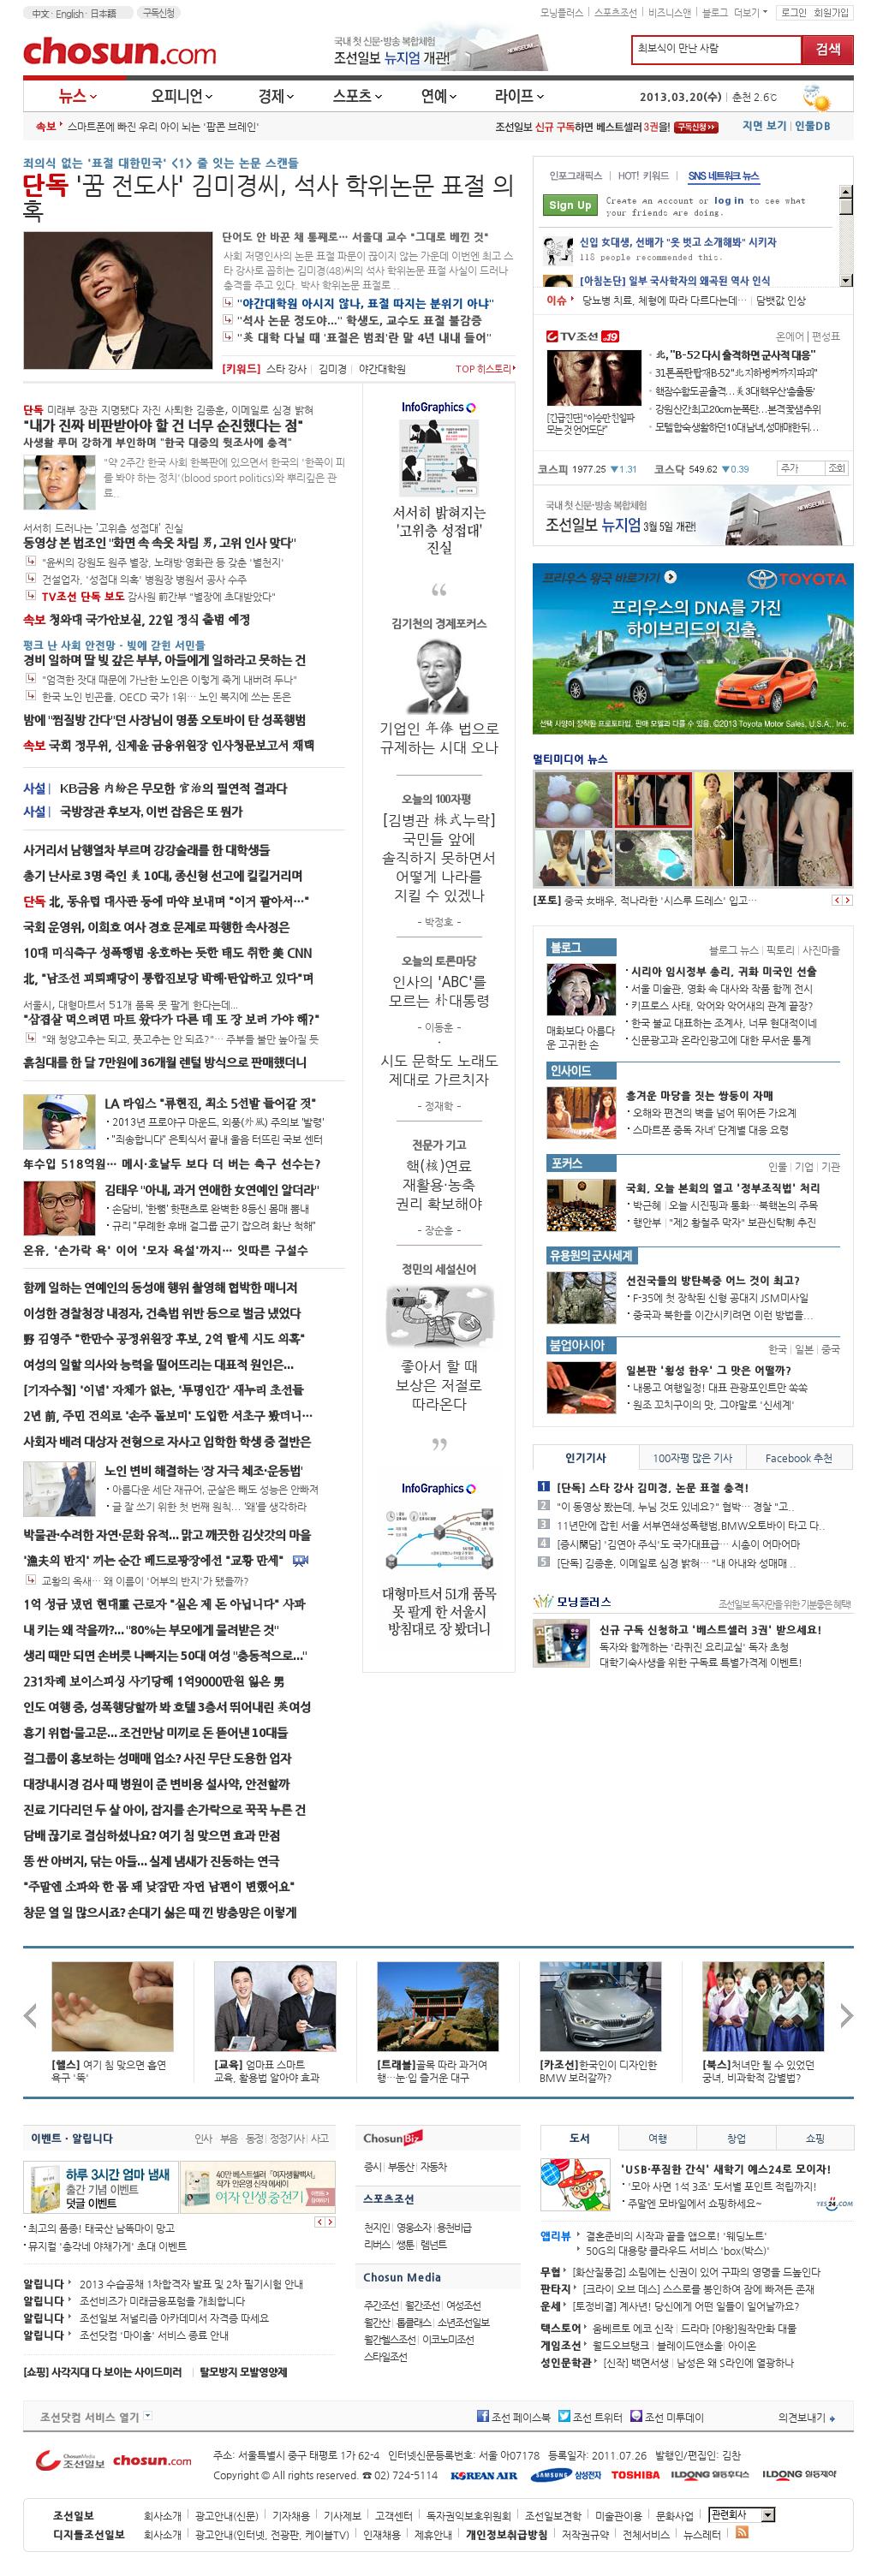 chosun.com at Wednesday March 20, 2013, 2:07 a.m. UTC